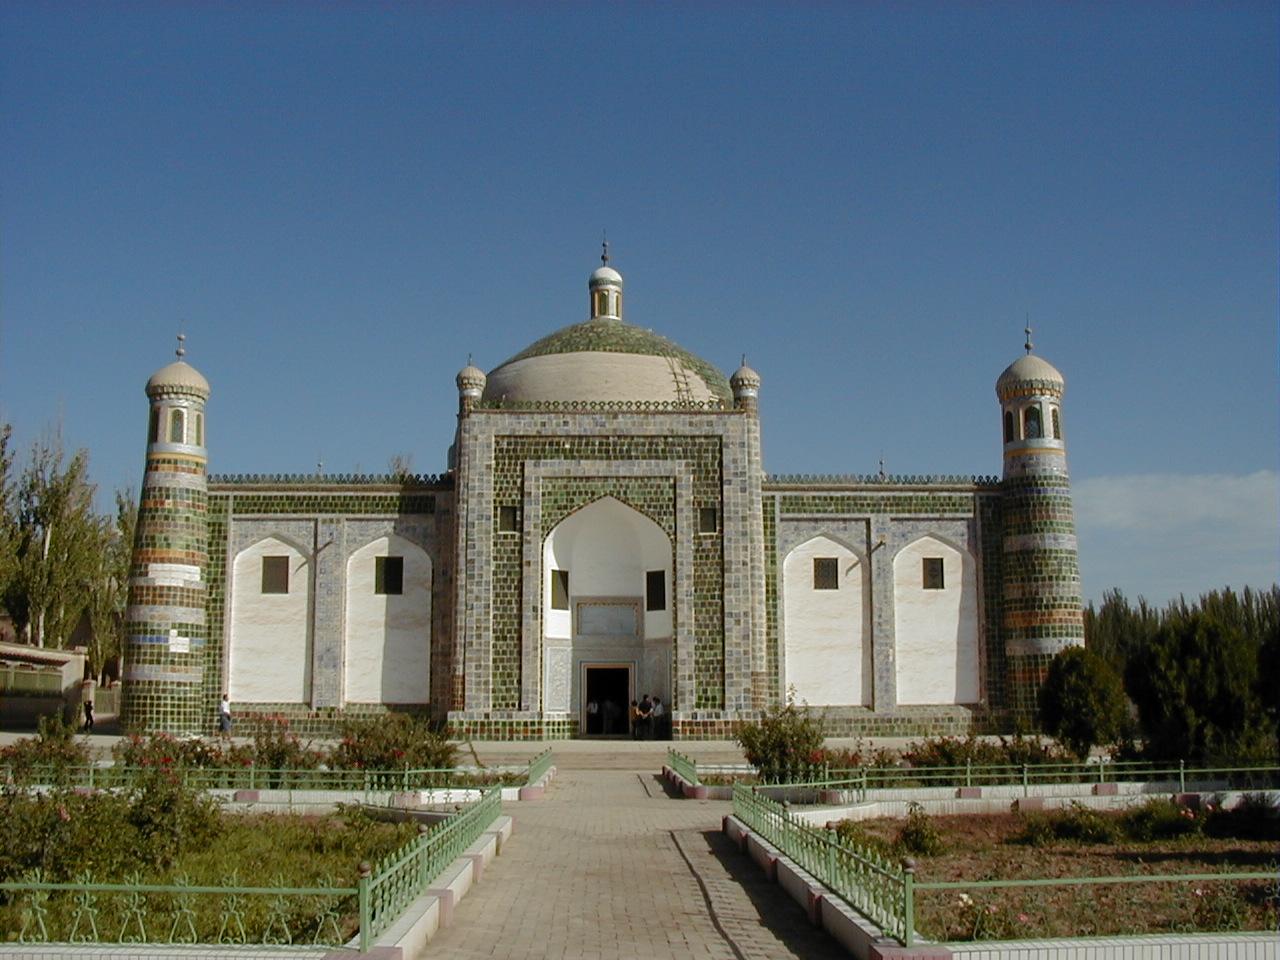 Abakh Khoja mazaar